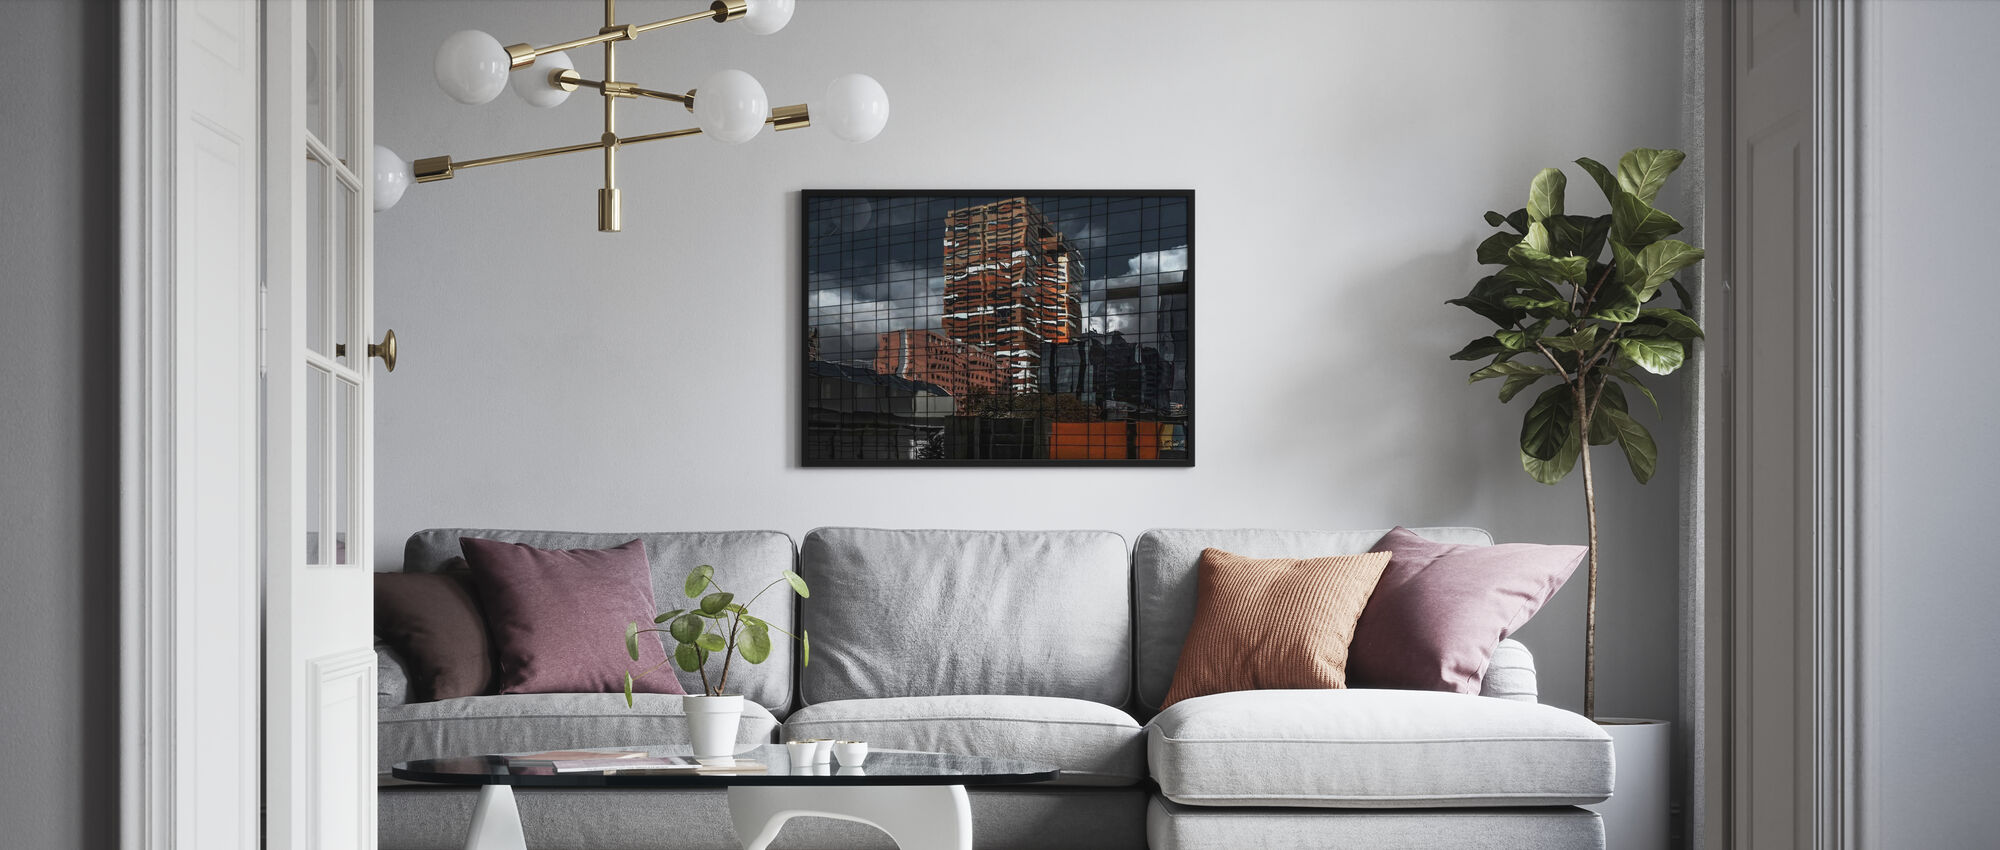 Pussel Reflektion - Poster - Vardagsrum